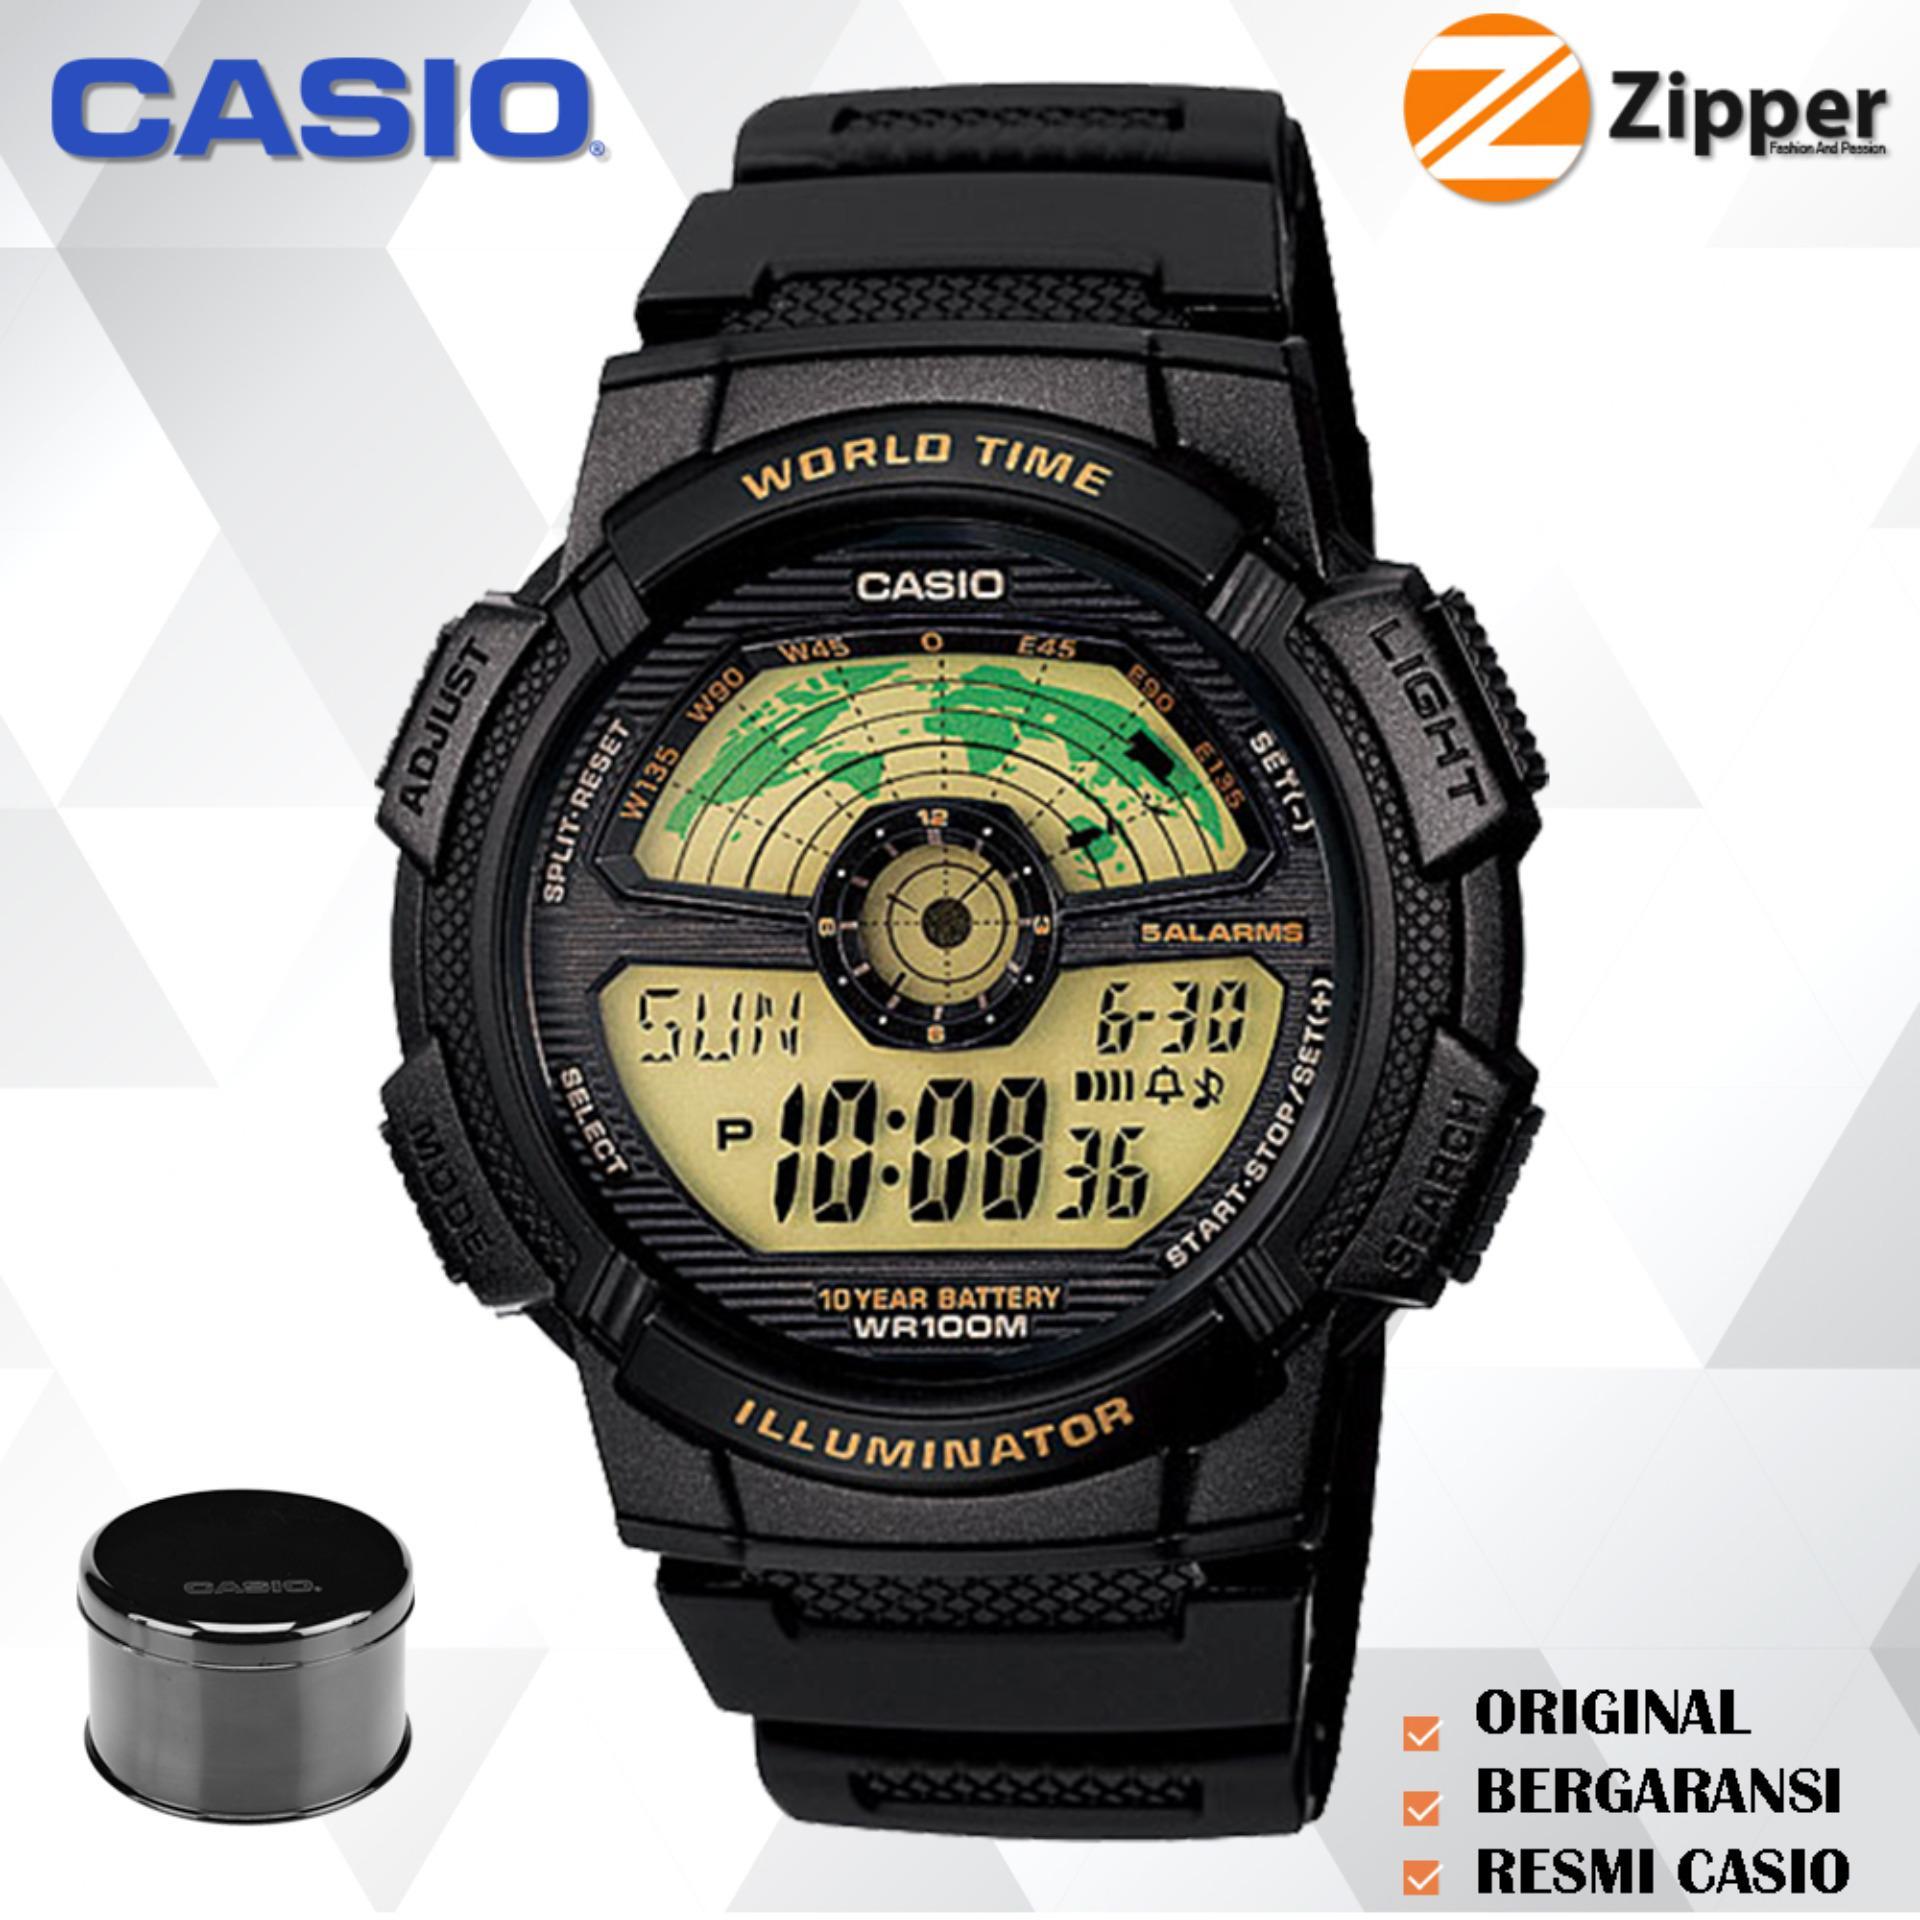 Casio Illuminator Jam Tangan Digital AE-1100W-1BVDF Youth Series - Tali Karet